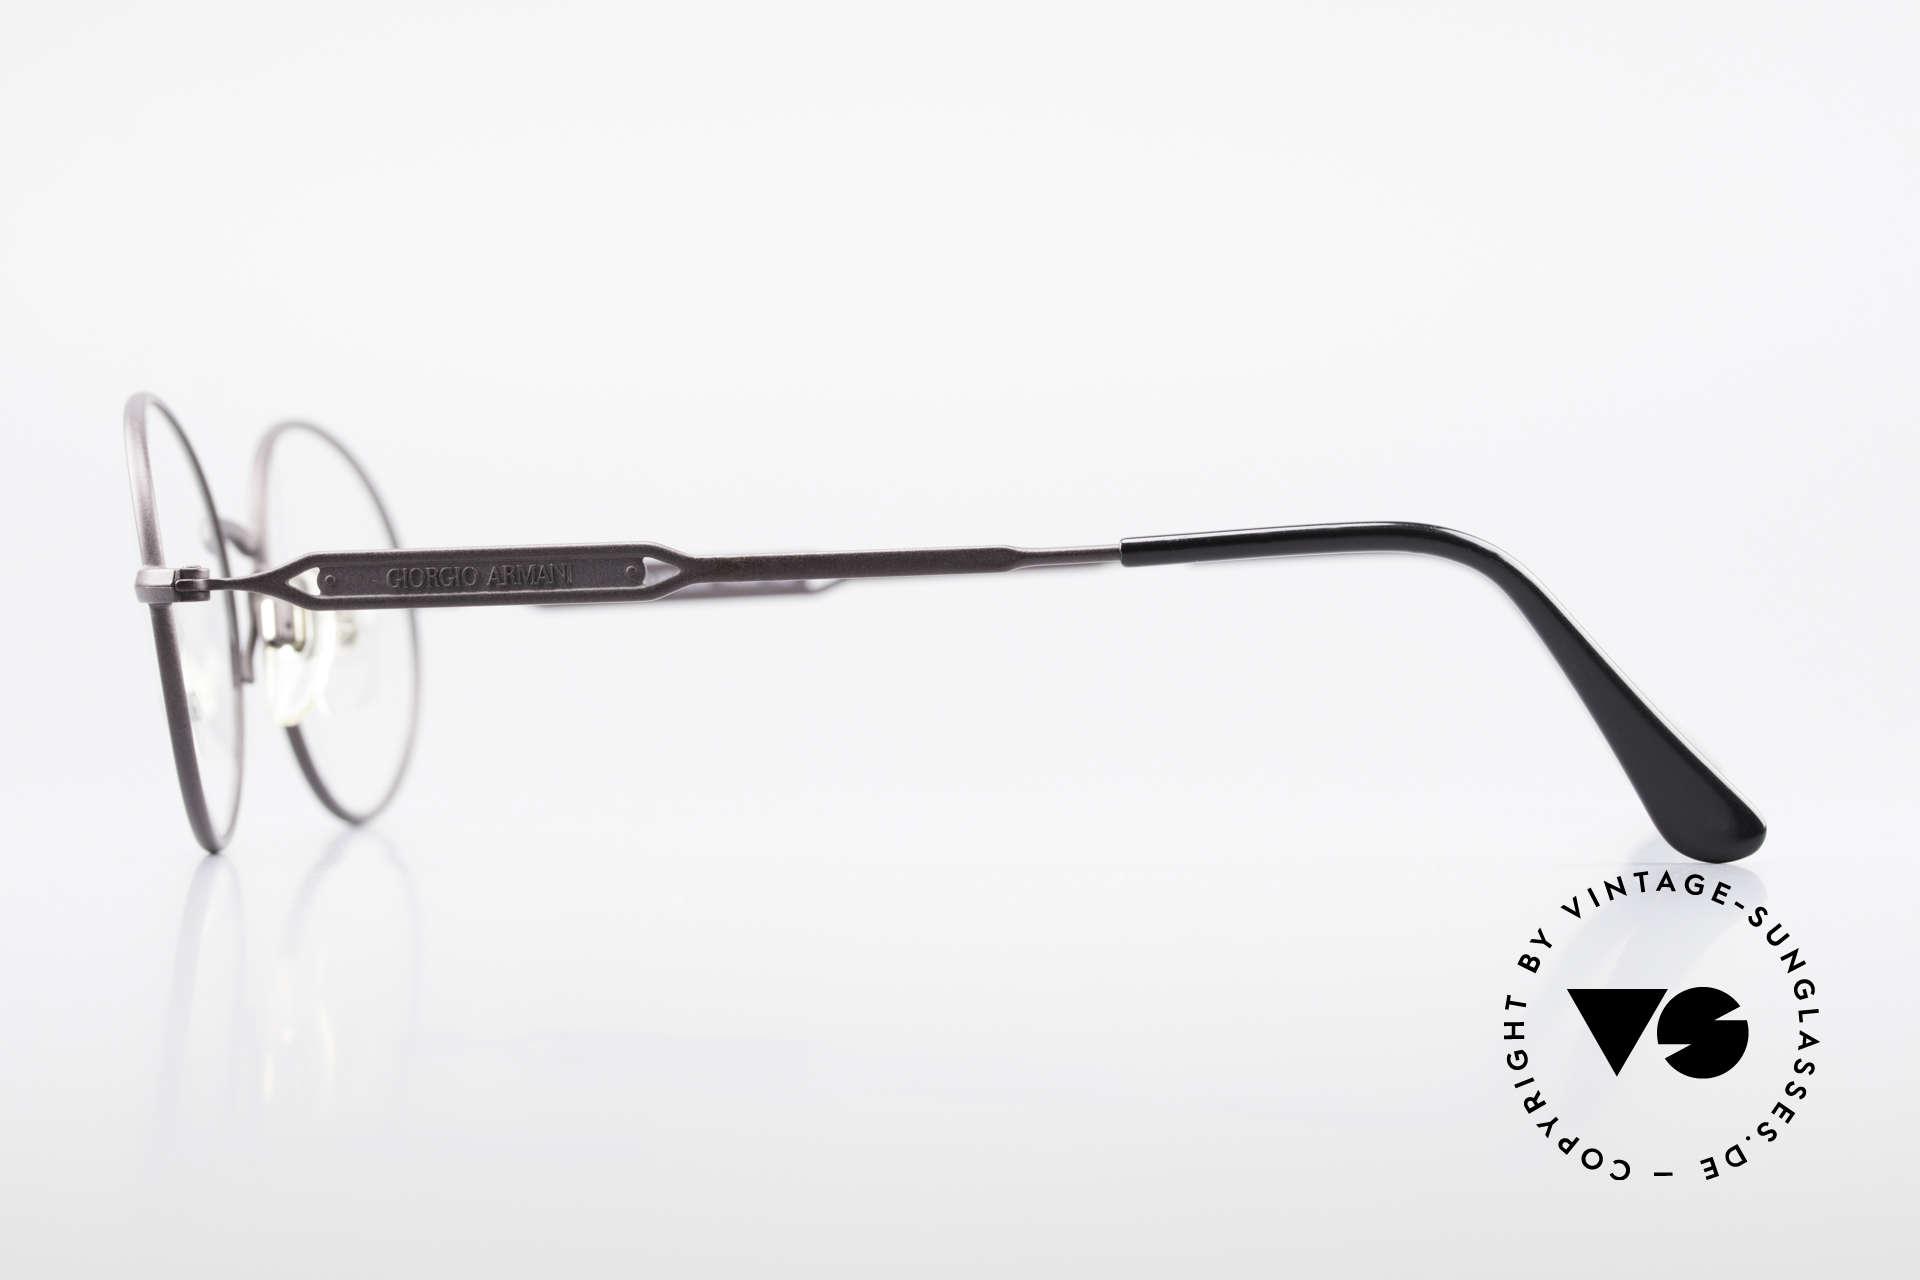 Giorgio Armani 241 No Retro Glasses Oval Vintage, NO RETRO EYEWEAR, but a 25 years old ORIGINAL!, Made for Men